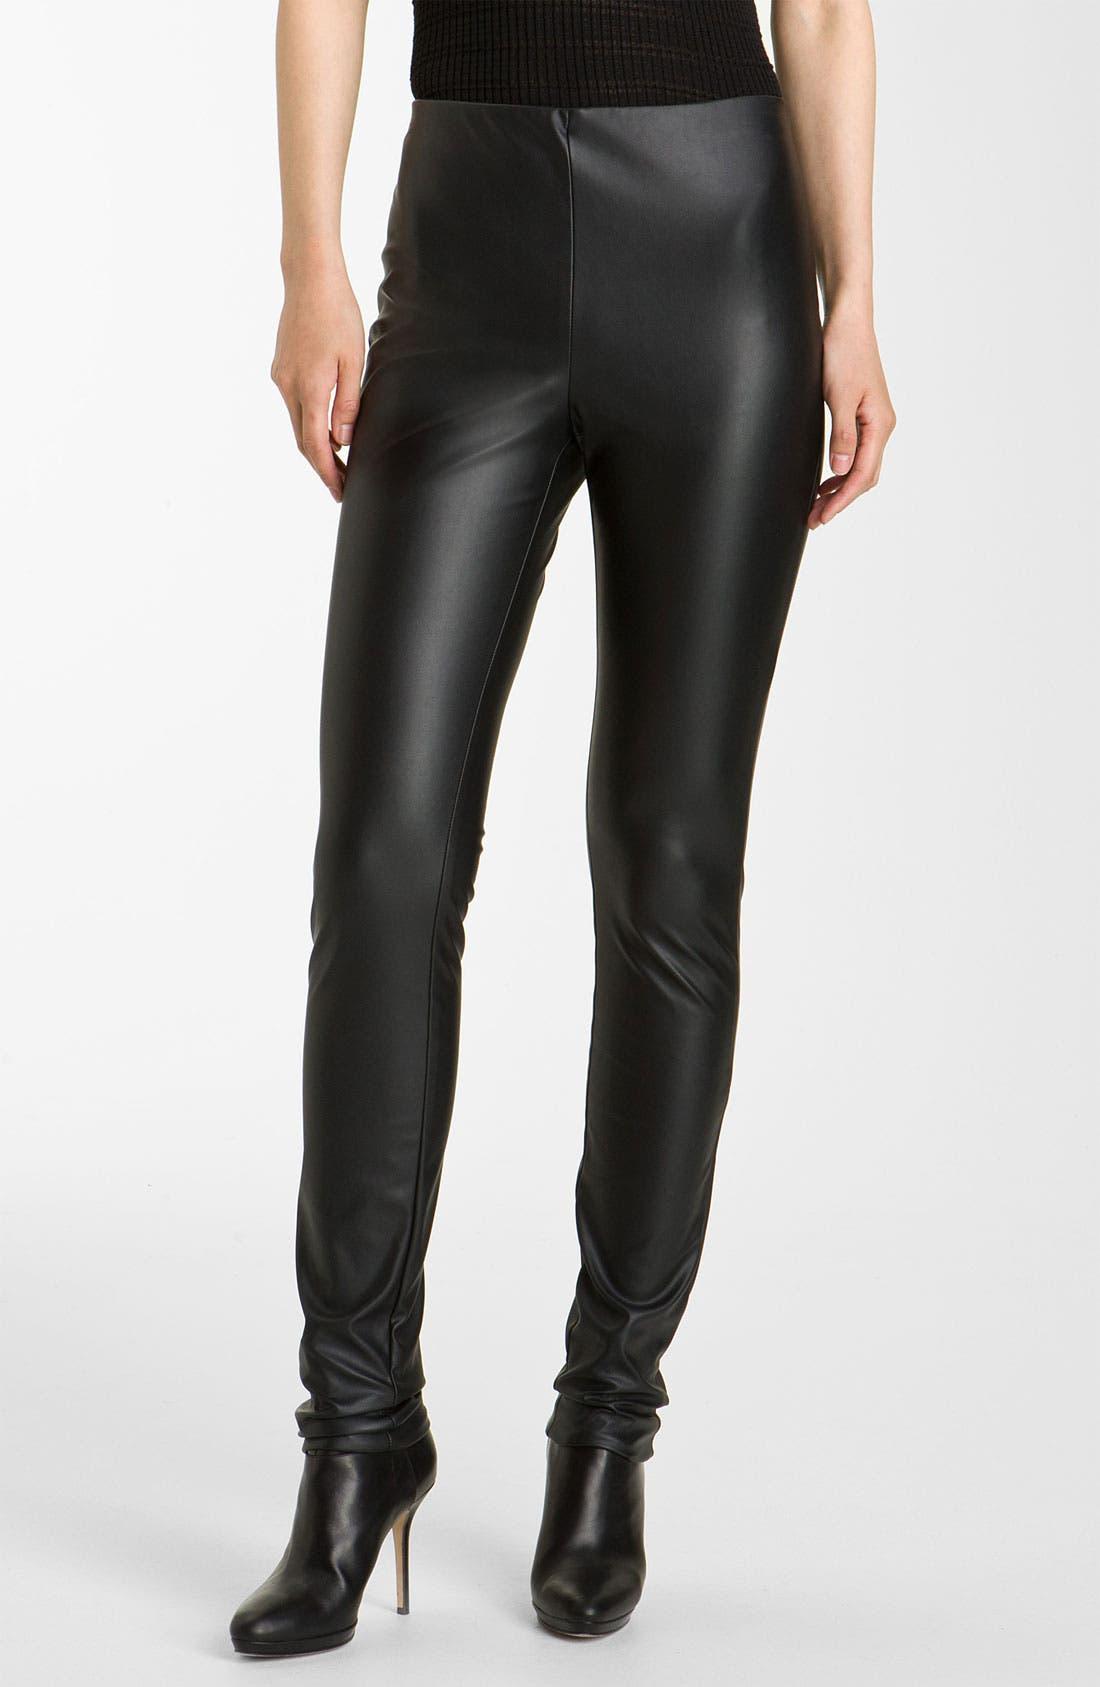 Alternate Image 1 Selected - M Missoni Faux Leather Leggings